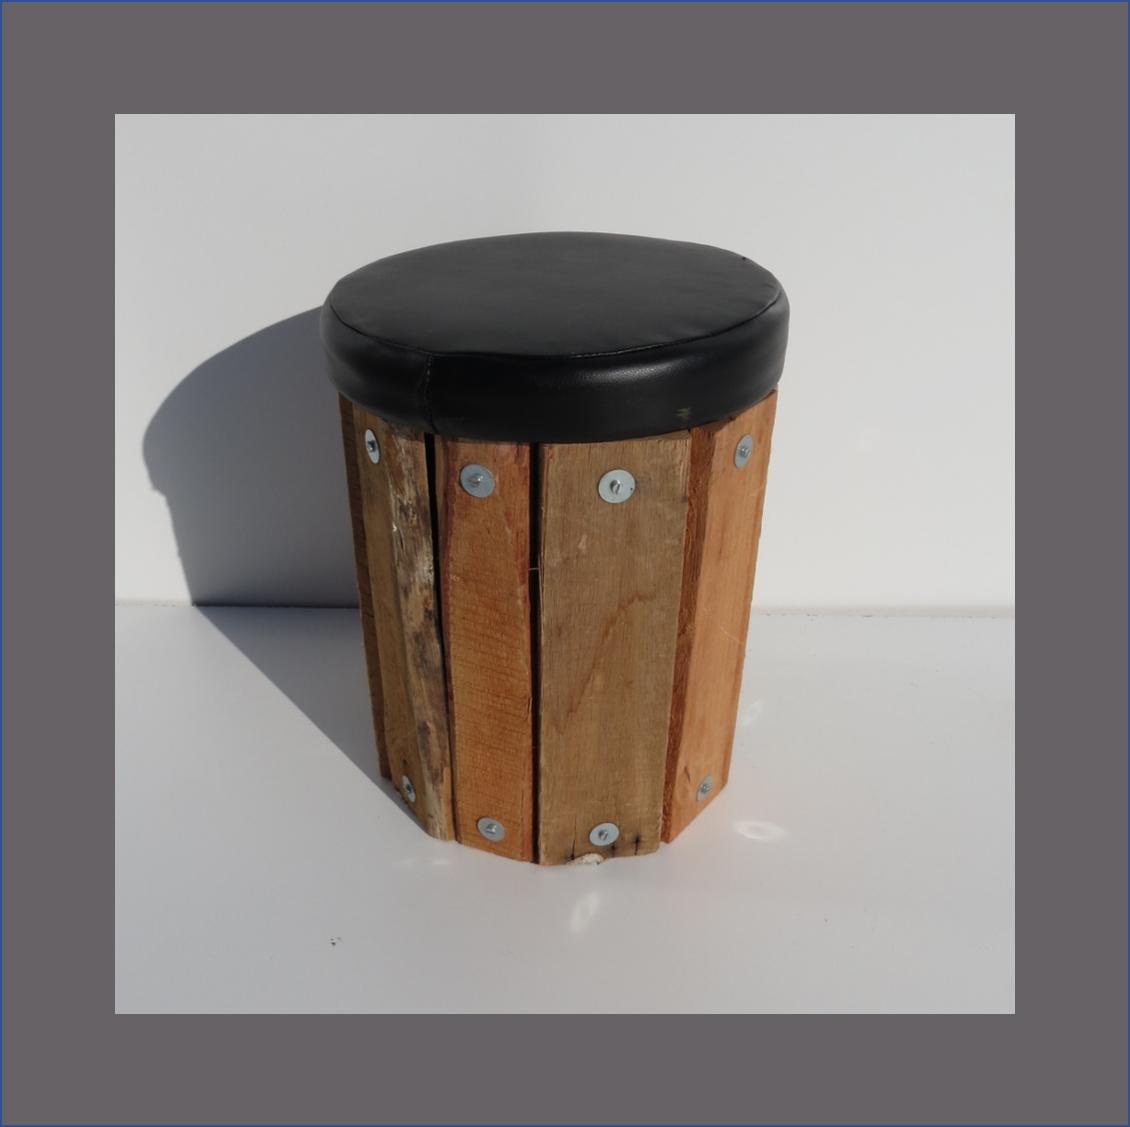 drum-ottoman-pine-vertical-slats